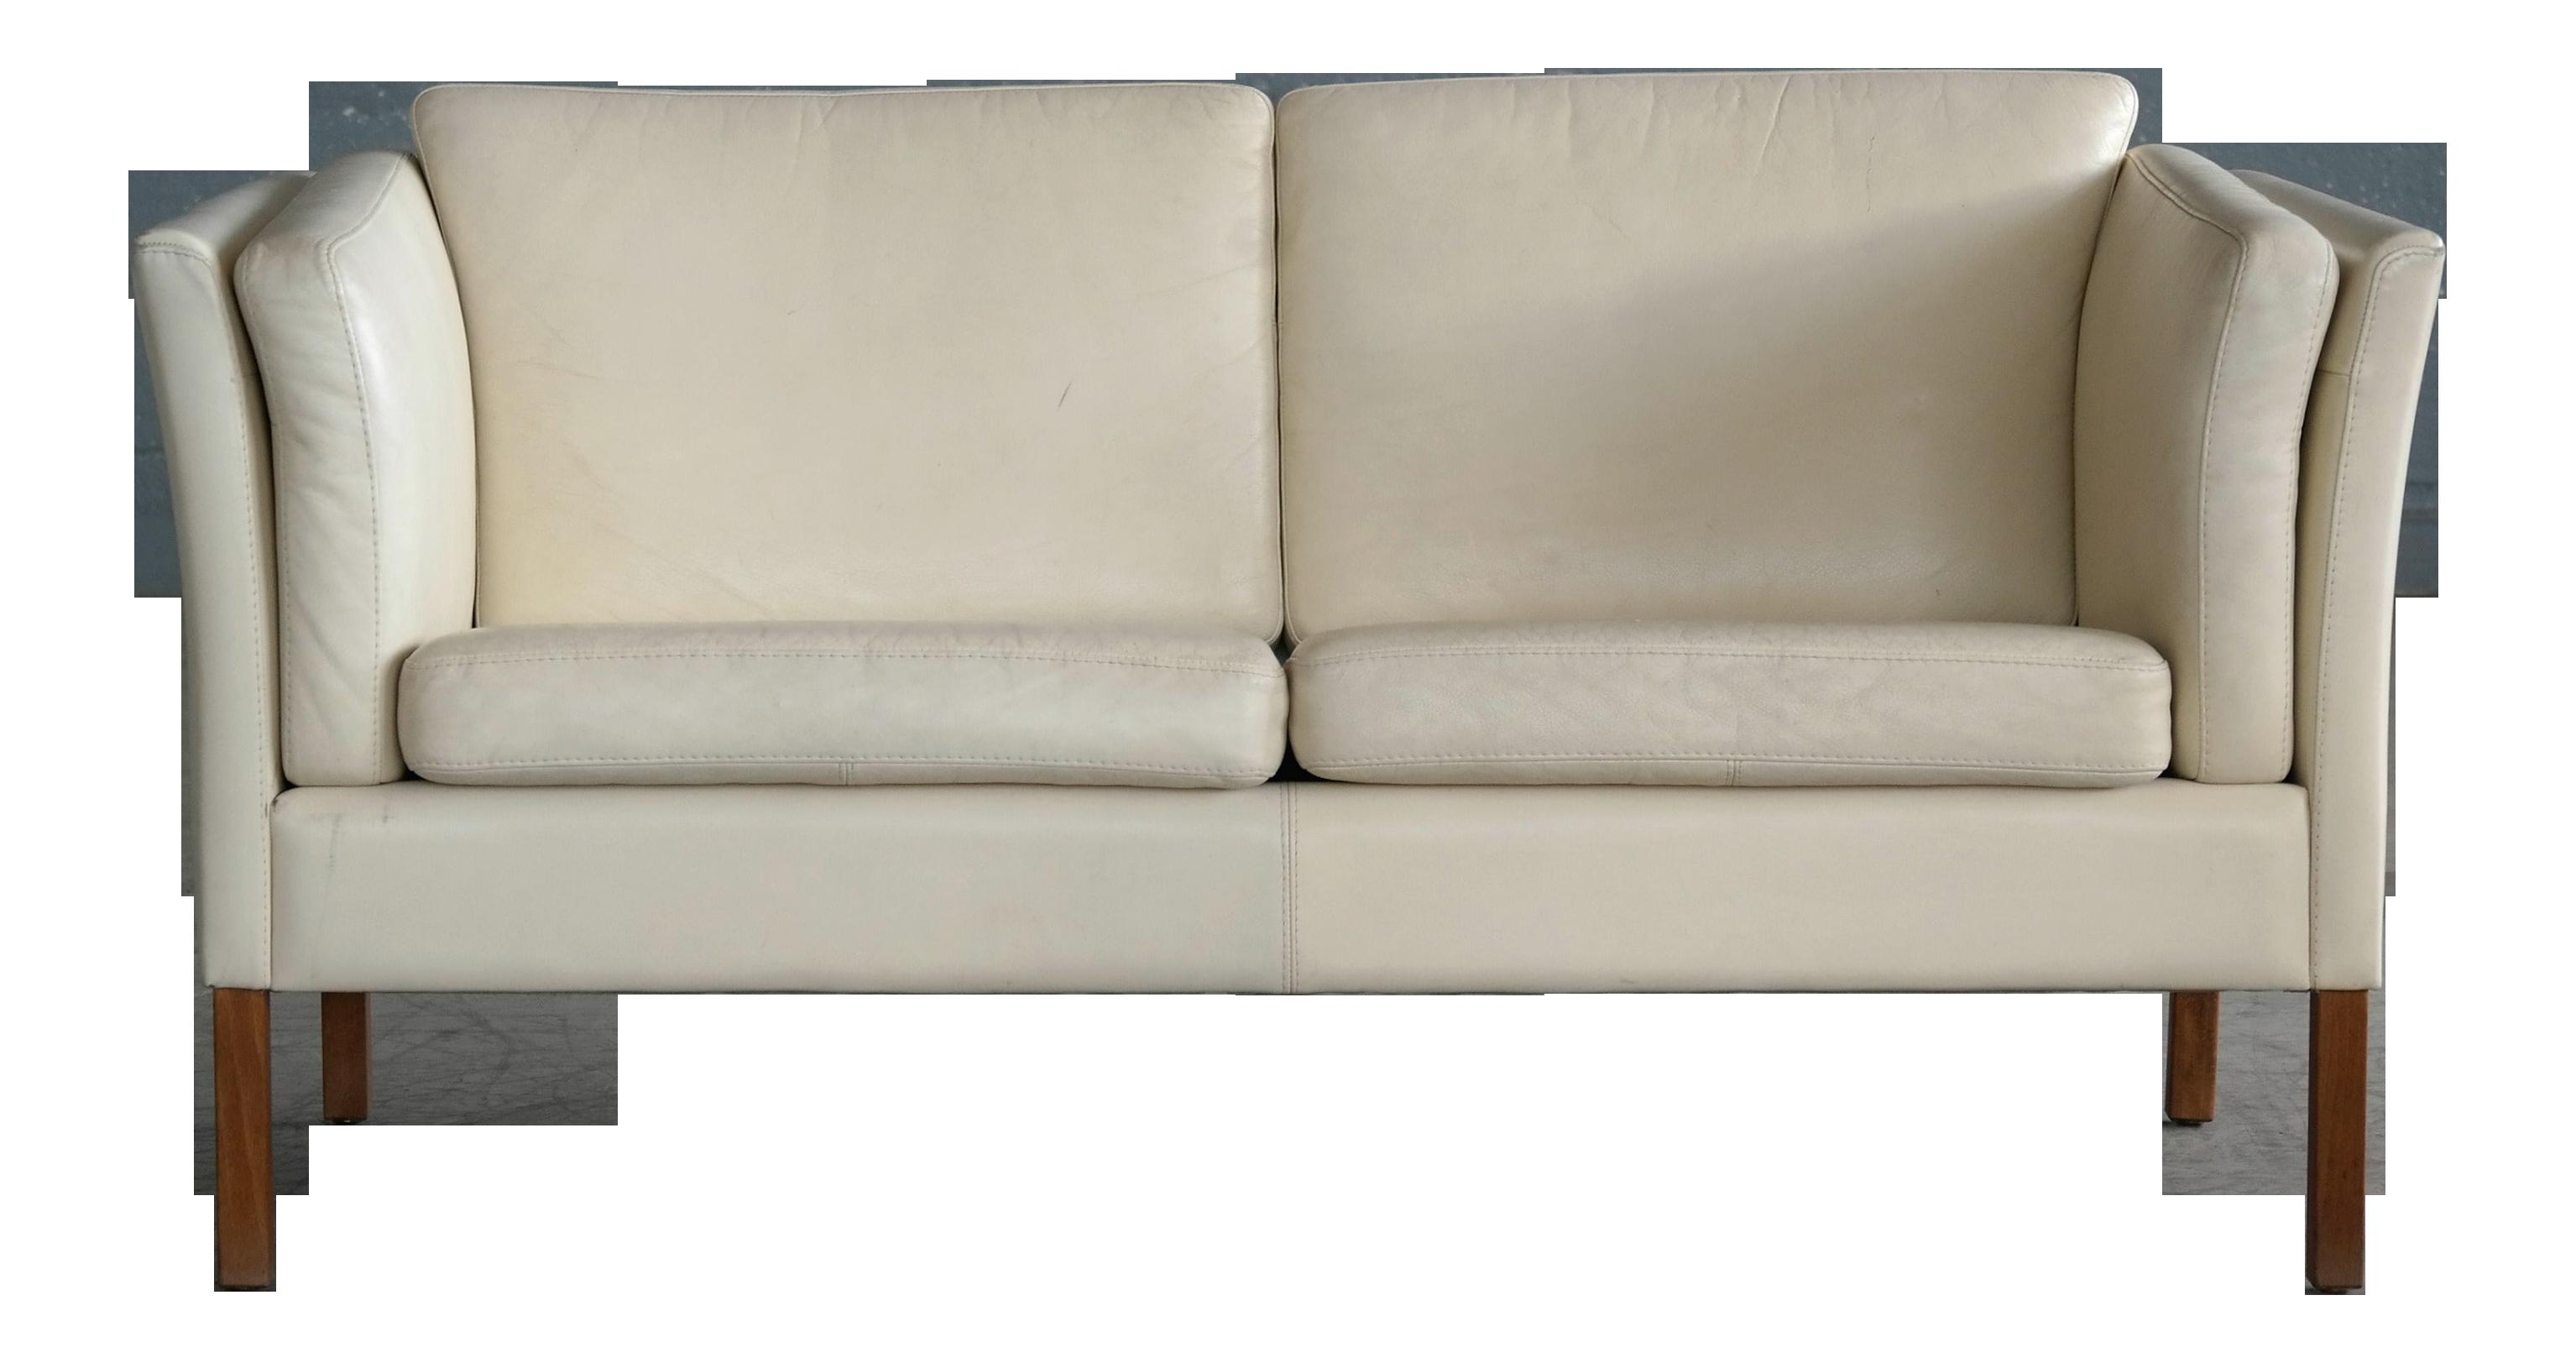 Miraculous 1960S Danish Loveseat In Cream Leather Attributed To Borge Mogensen Uwap Interior Chair Design Uwaporg